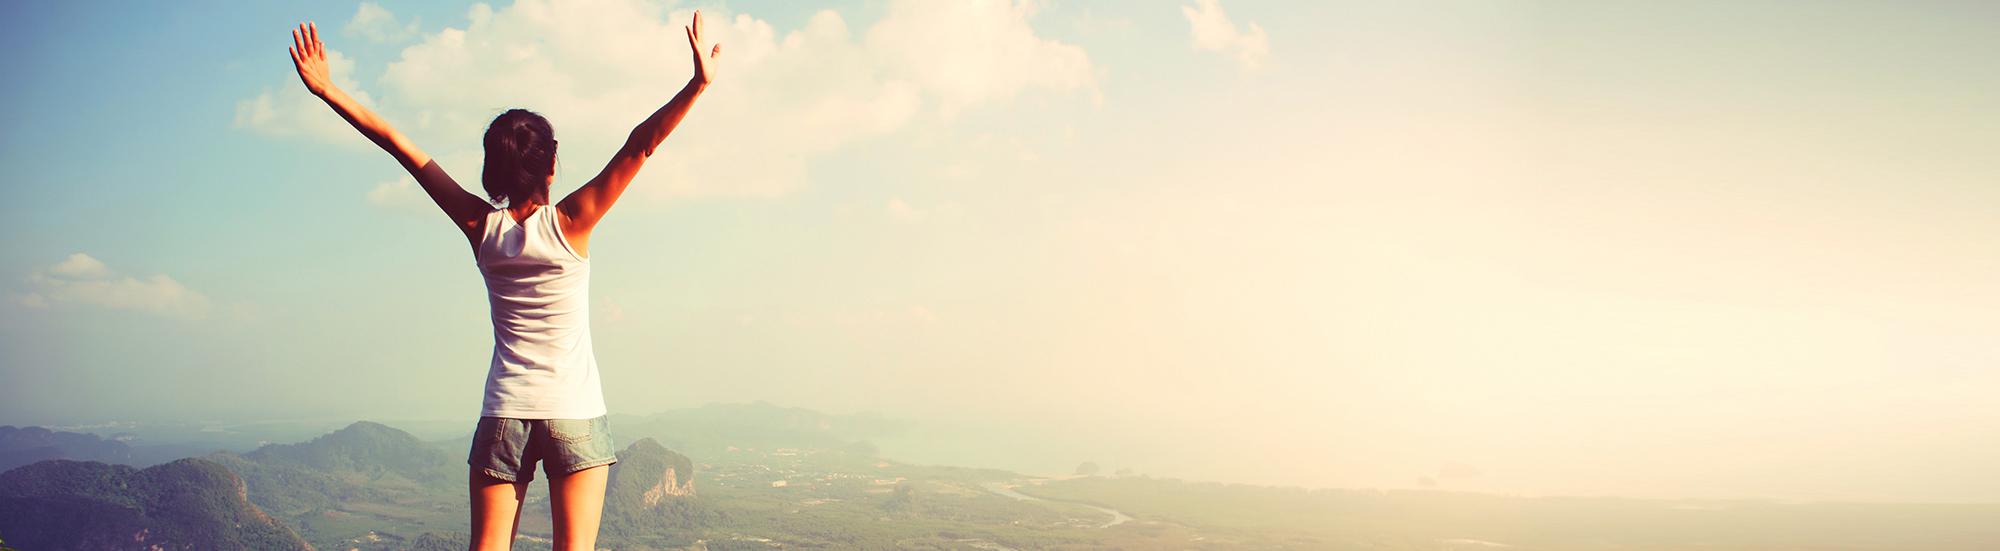 woman hiker enjoy the view on mountain peak cliff